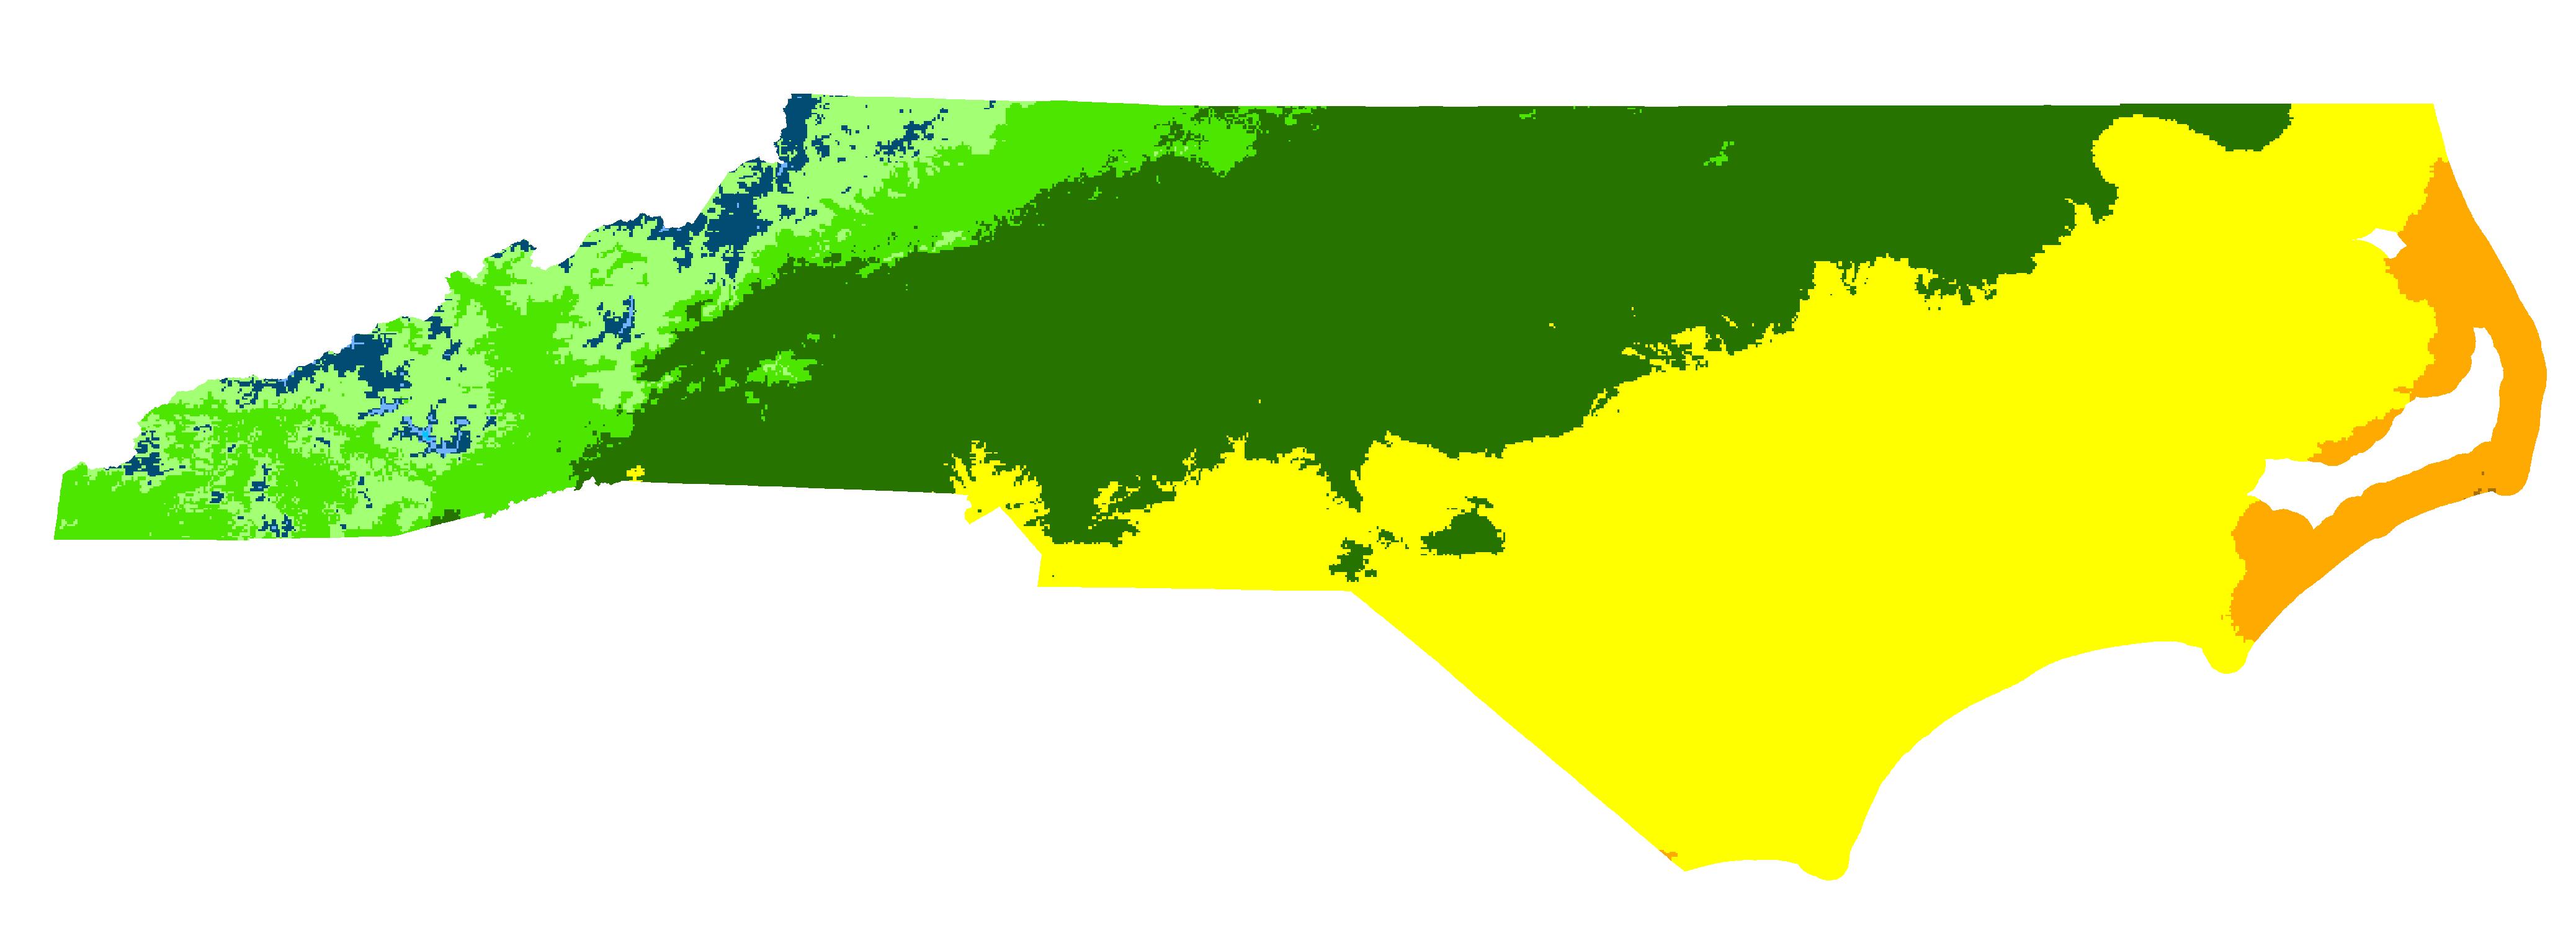 Rutherford County, North Carolina Hardiness Zones